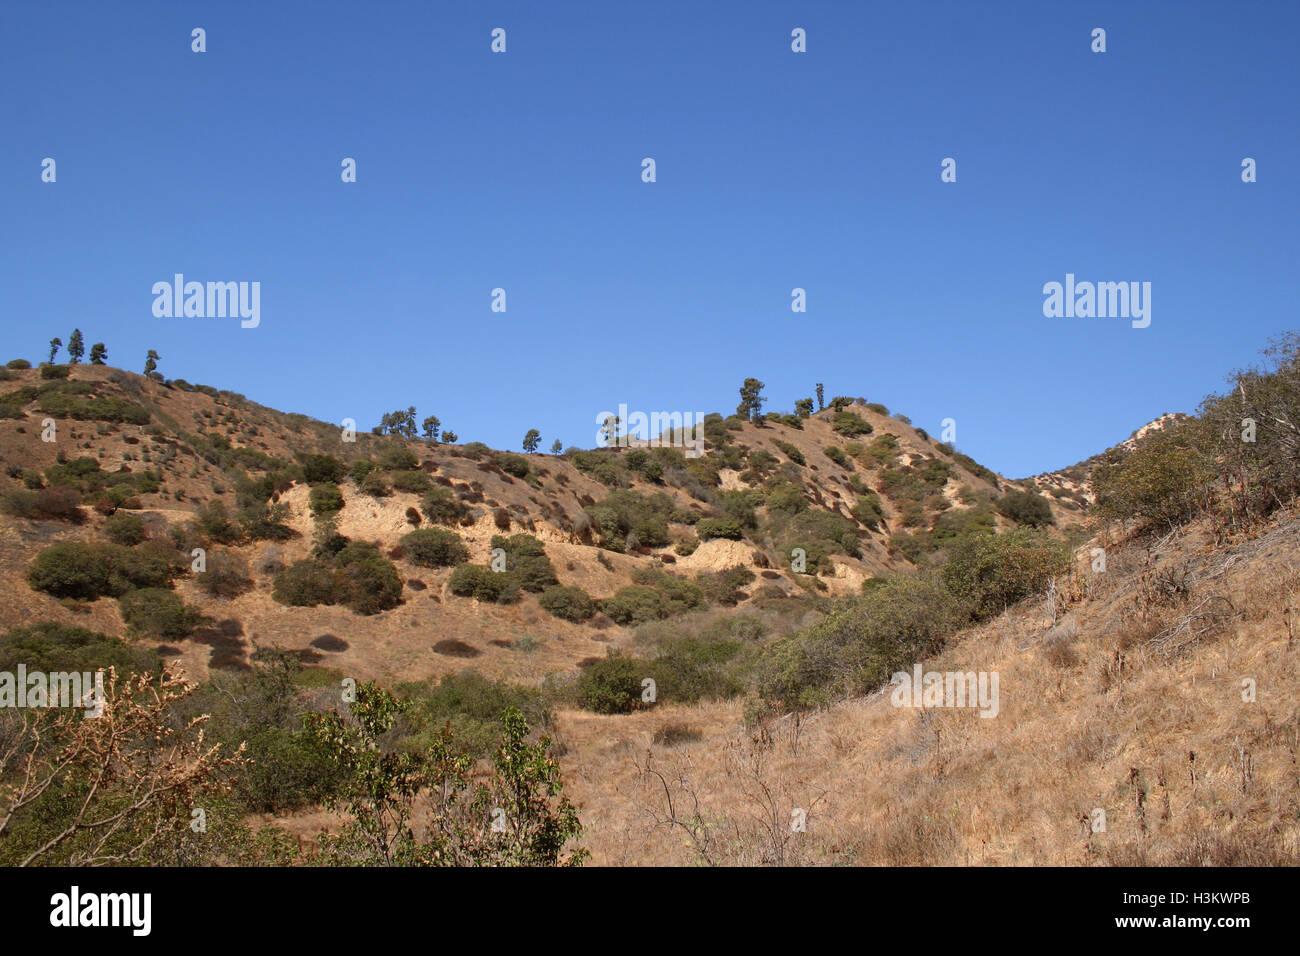 Desert Hills with Shrubs and Brush. - Stock Image